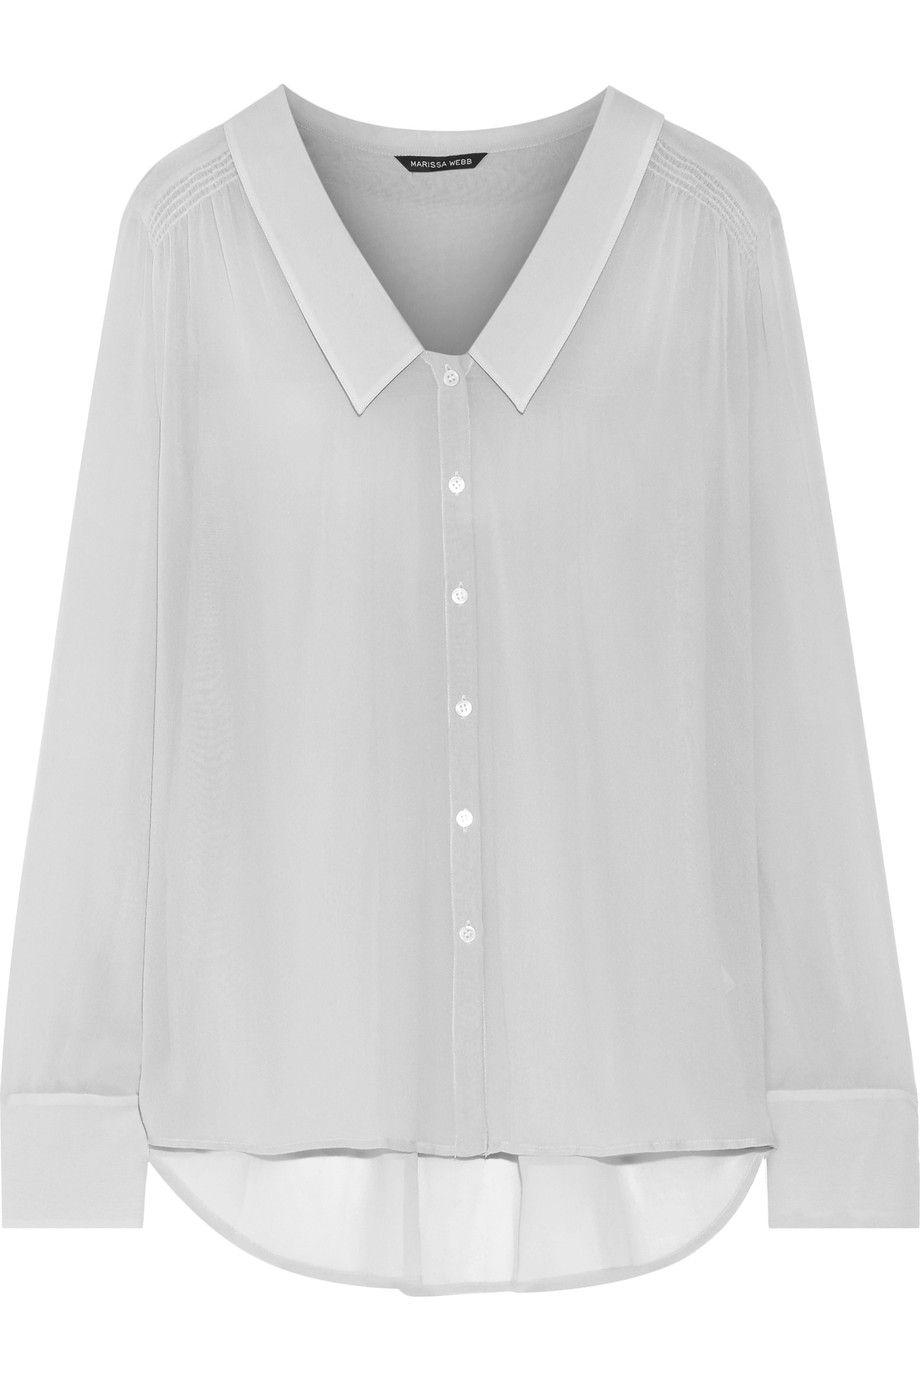 b7f02f6227be75 MARISSA WEBB Shania silk crepe de chine blouse.  marissawebb  cloth  blouse